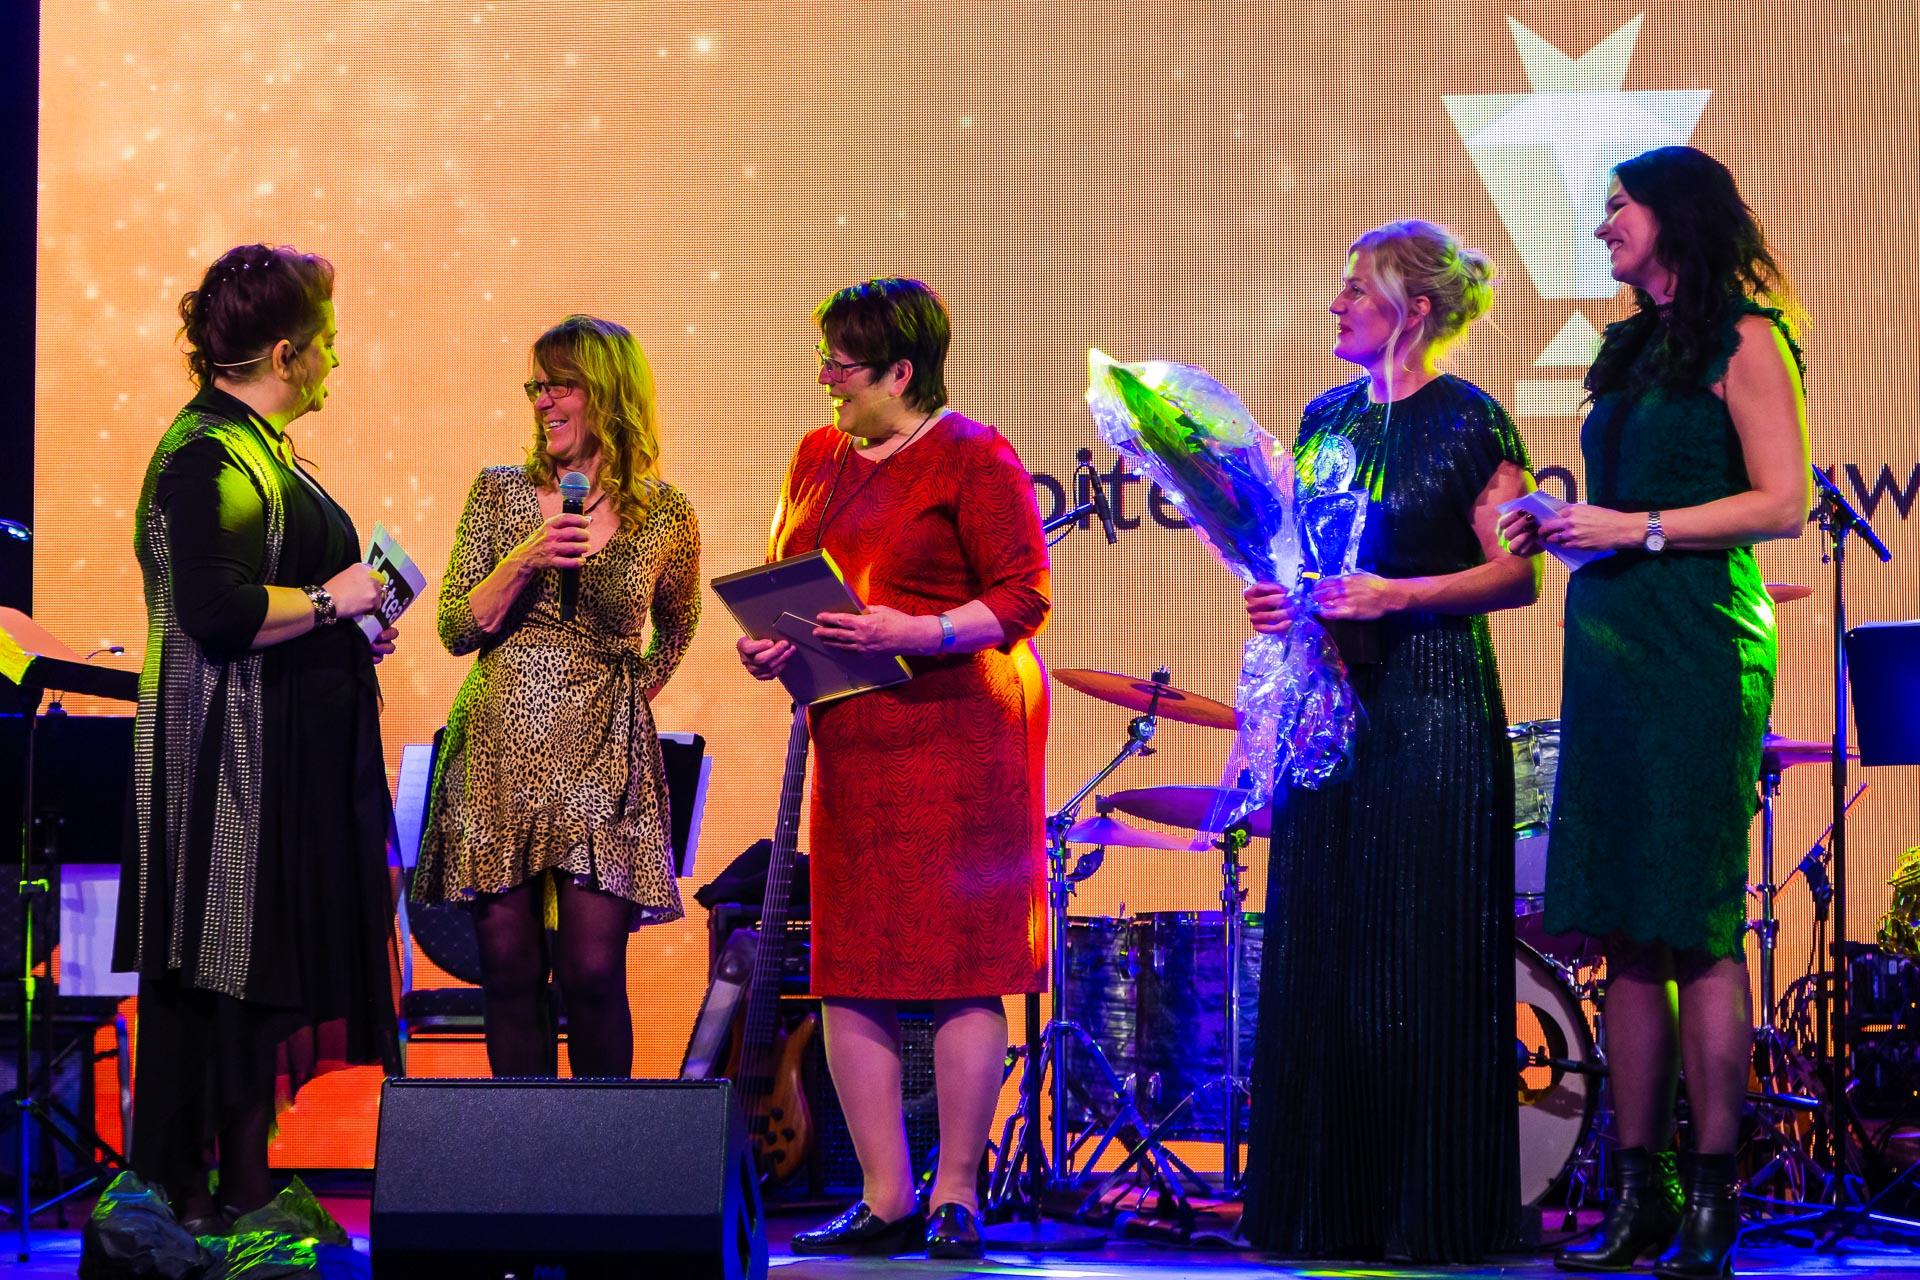 Mer glada pristagare 2019 på scenen